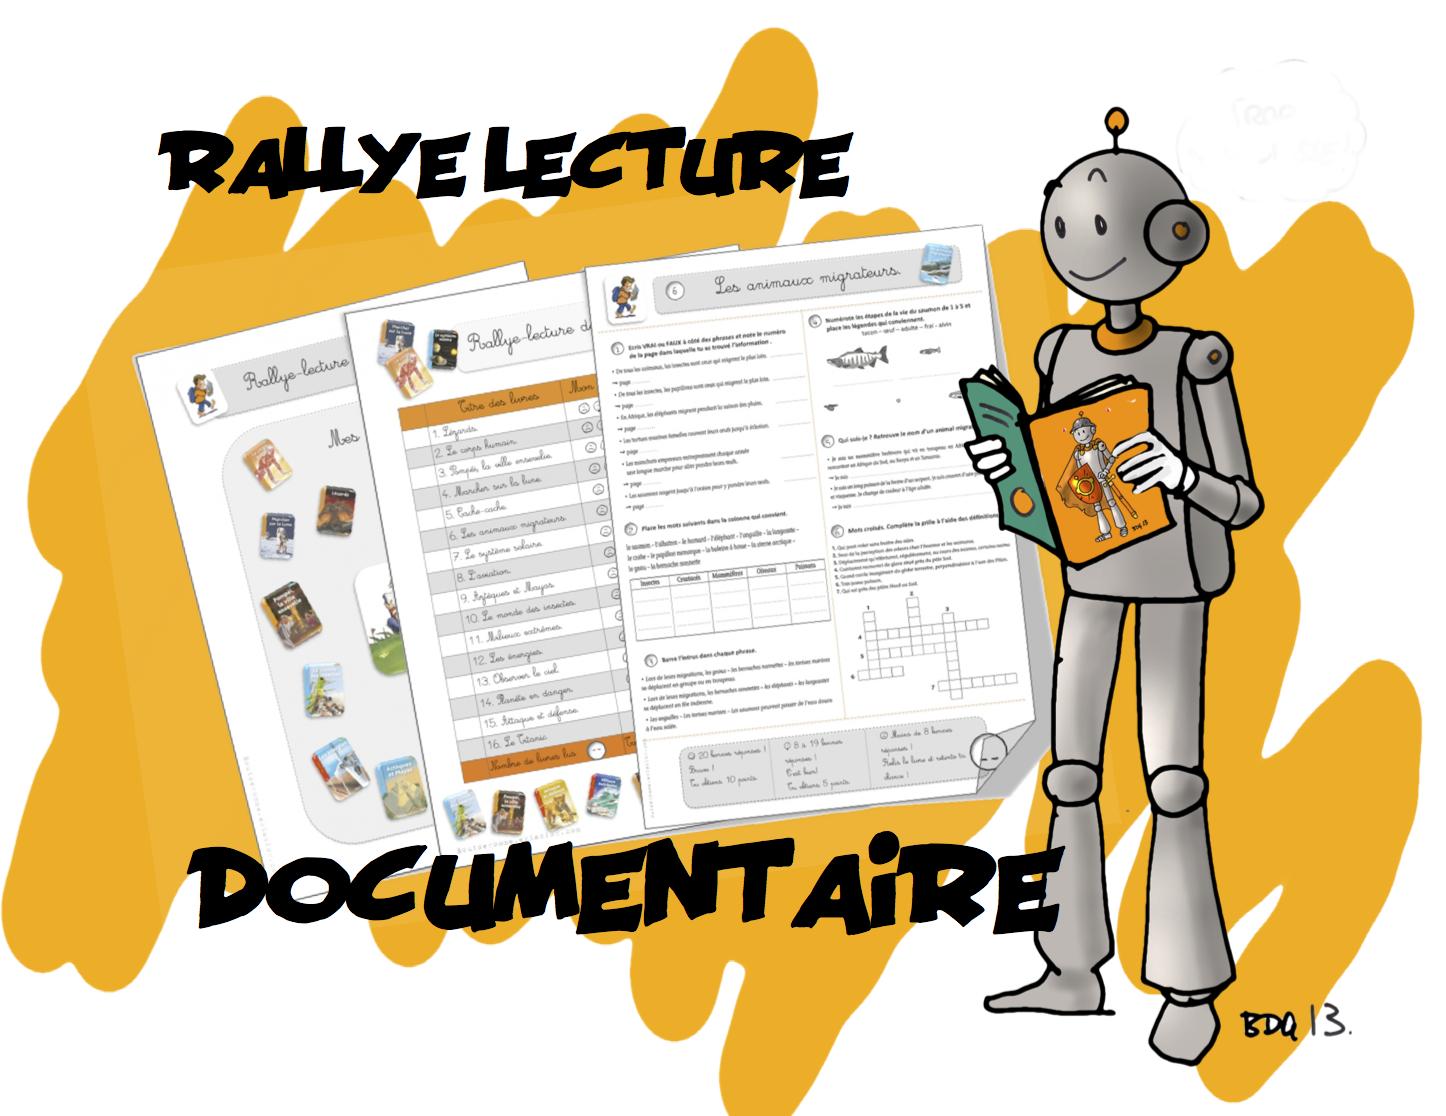 Ducation civique cycle 3 fiches photocopier Enseignement moral et civique Cycle 3 - Fichier photocopier CD